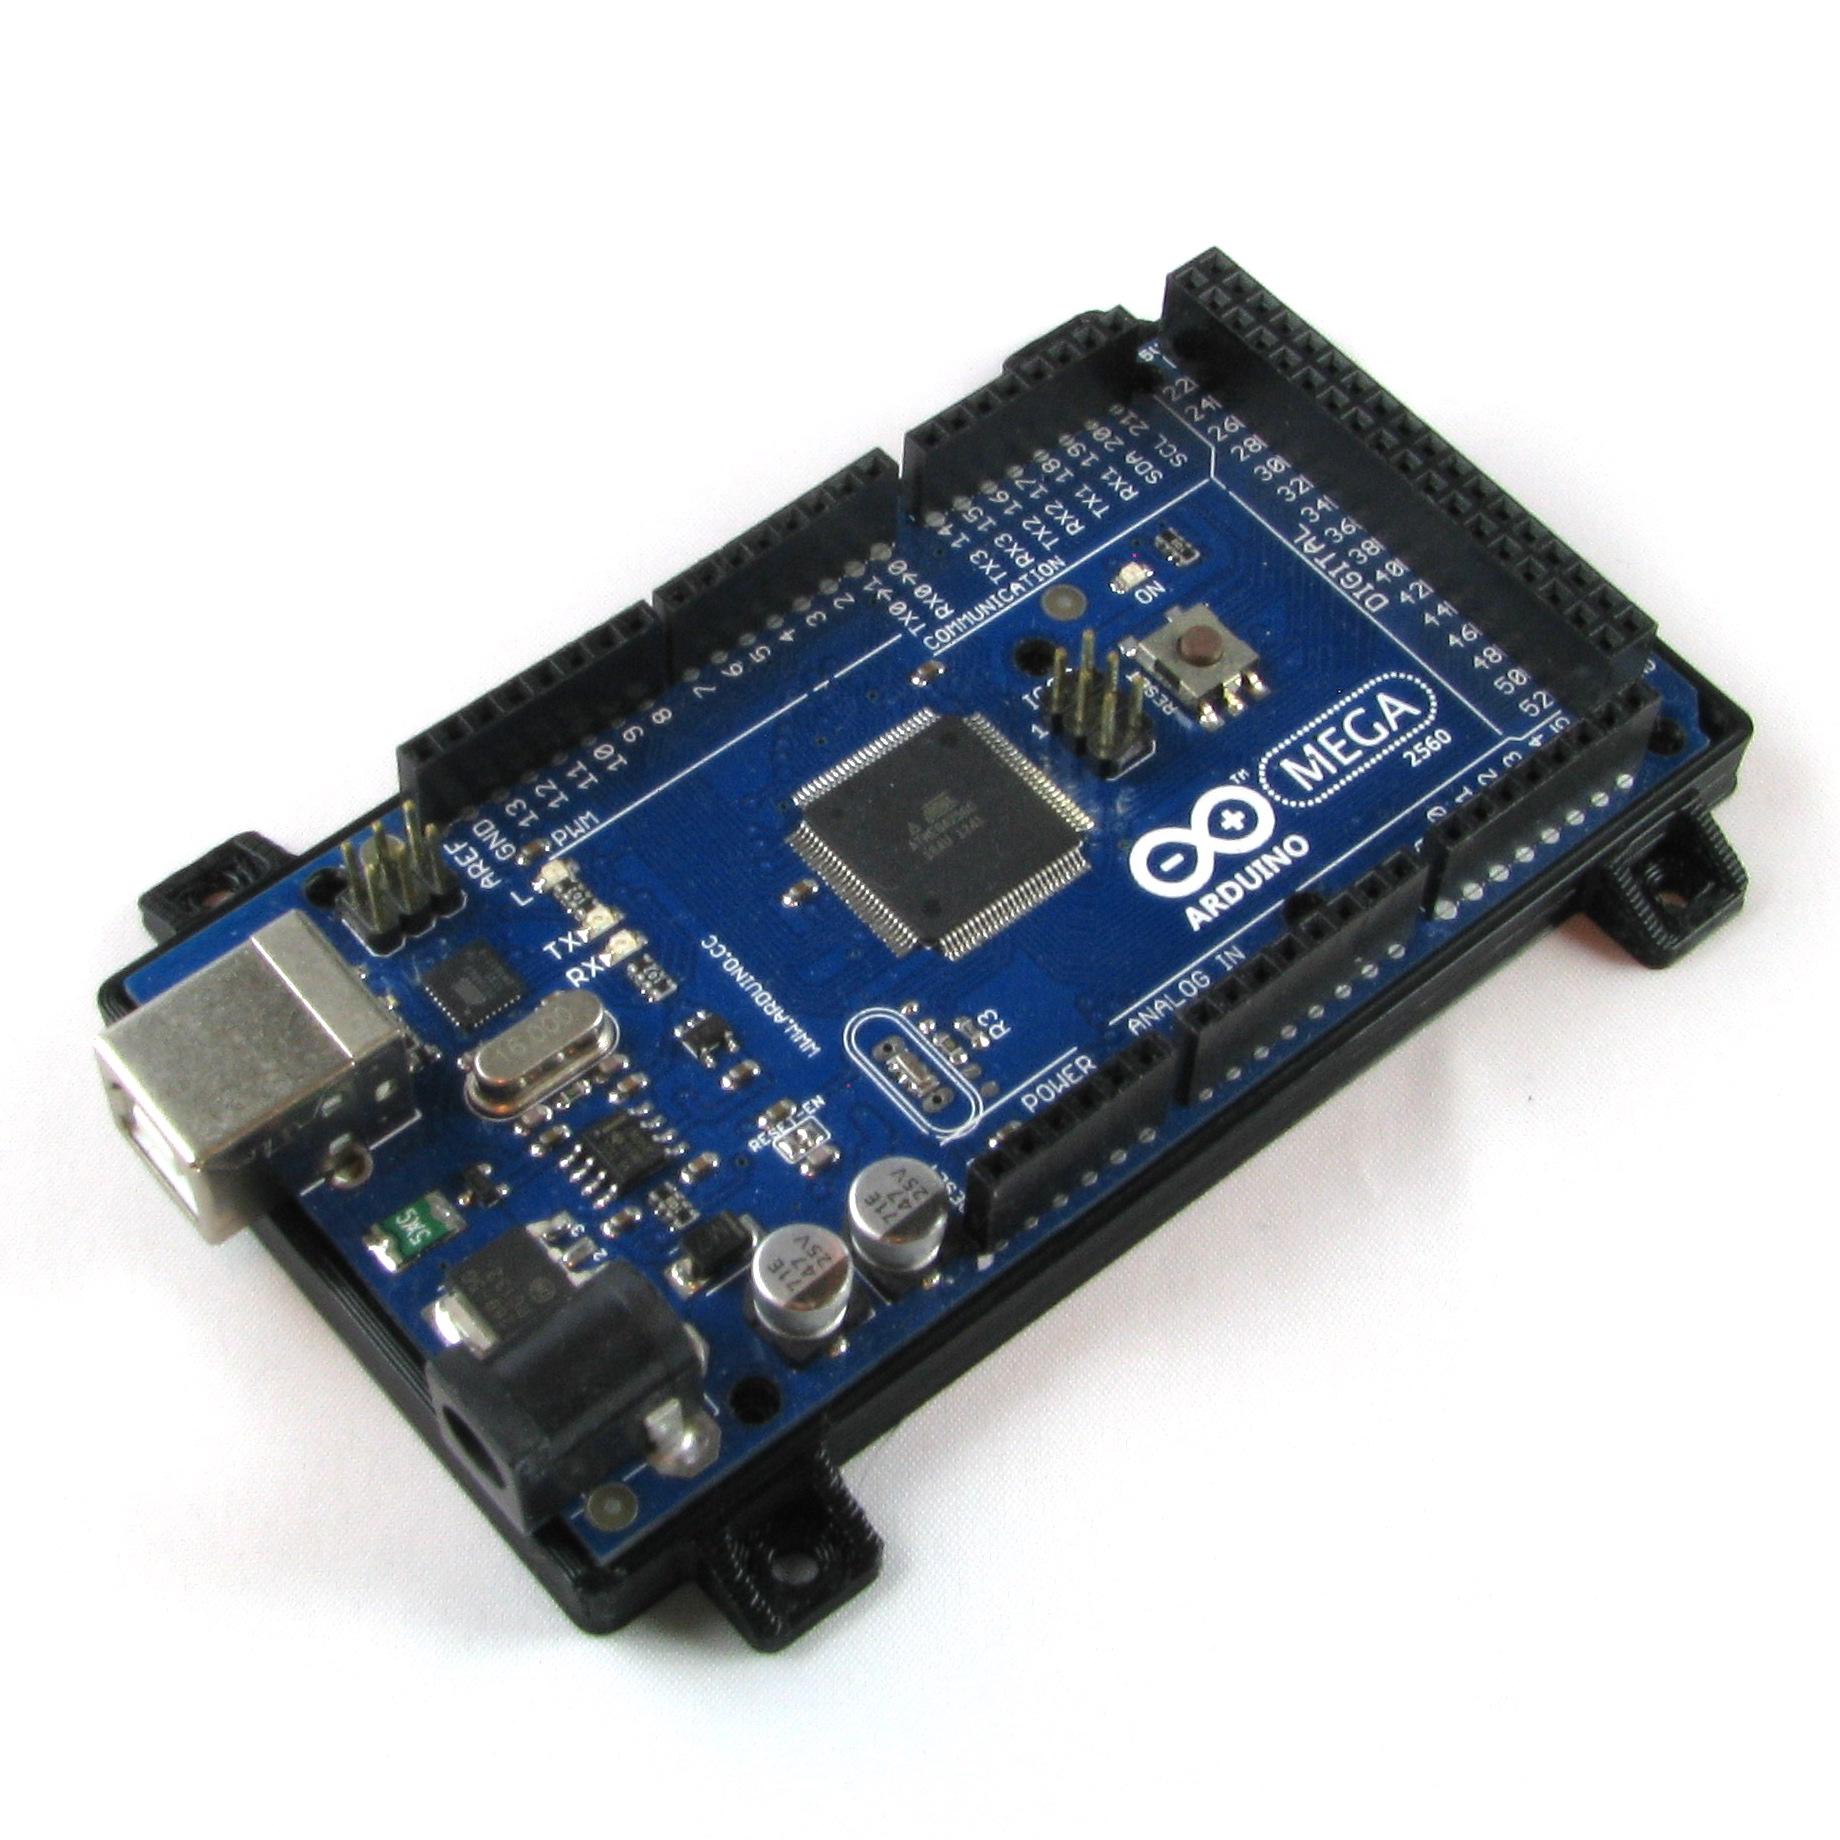 Arduino mega mount get surreal